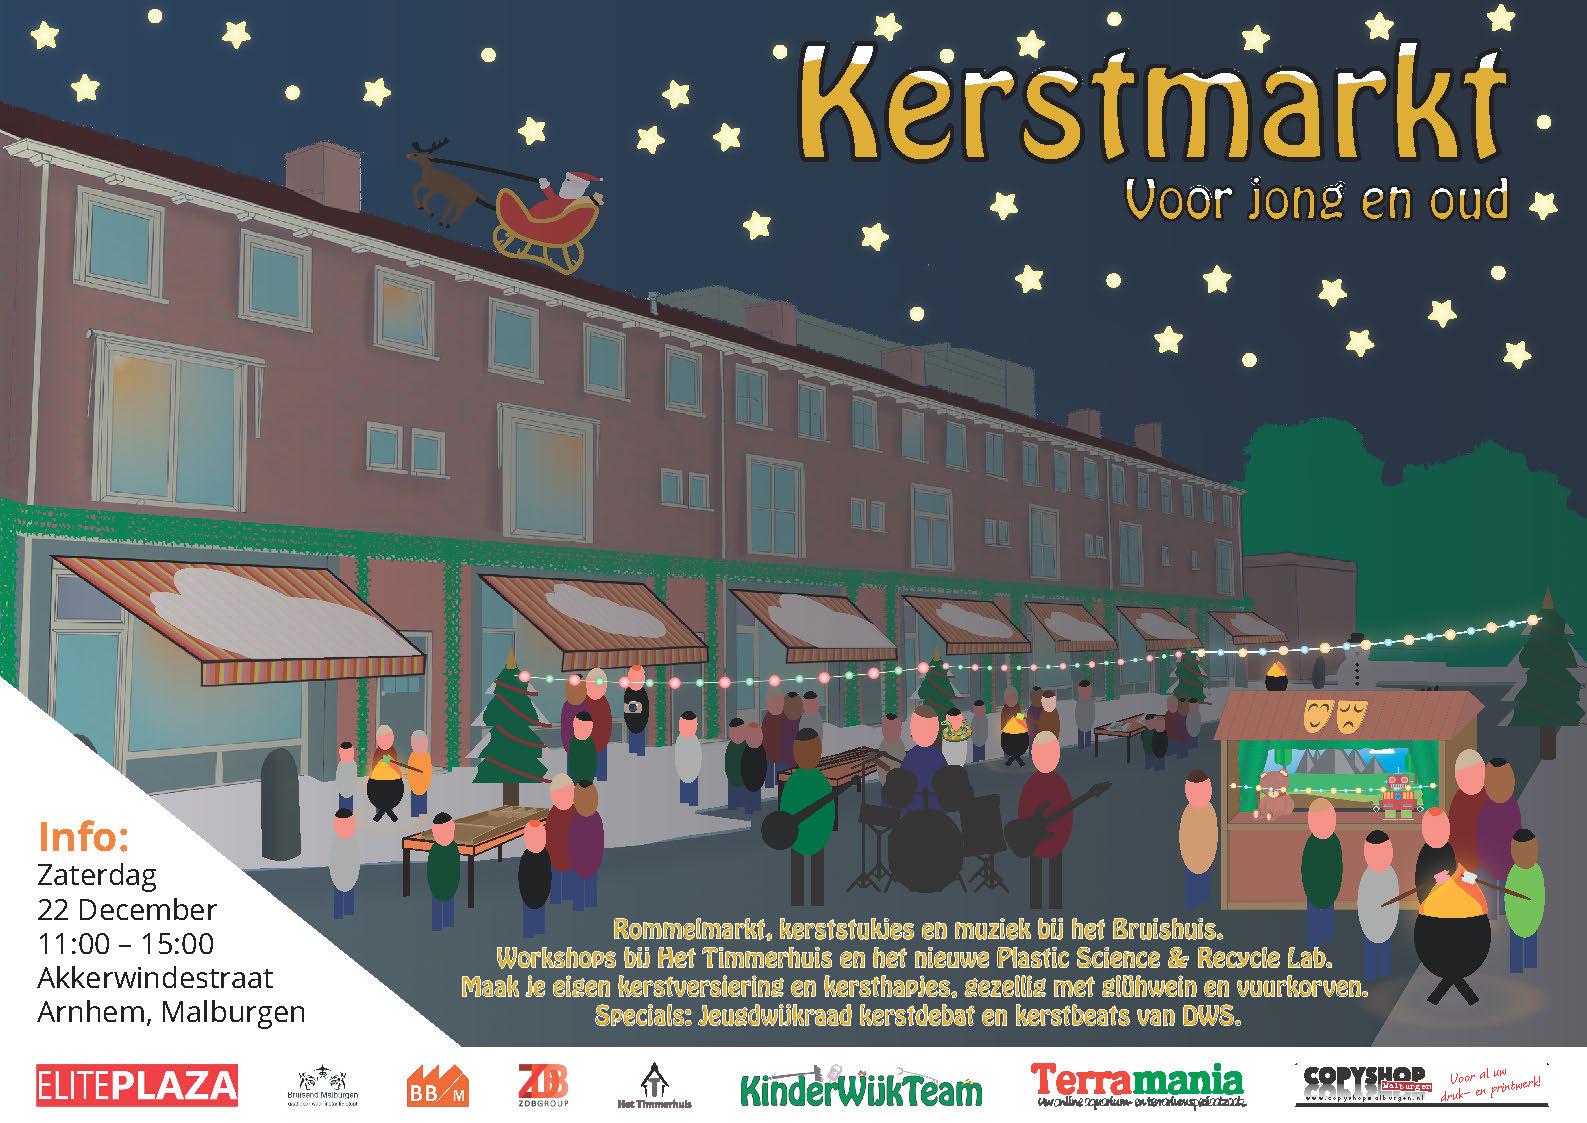 Zaterdag 22 December Akkerwindestraat In Kerstsfeer Malburger